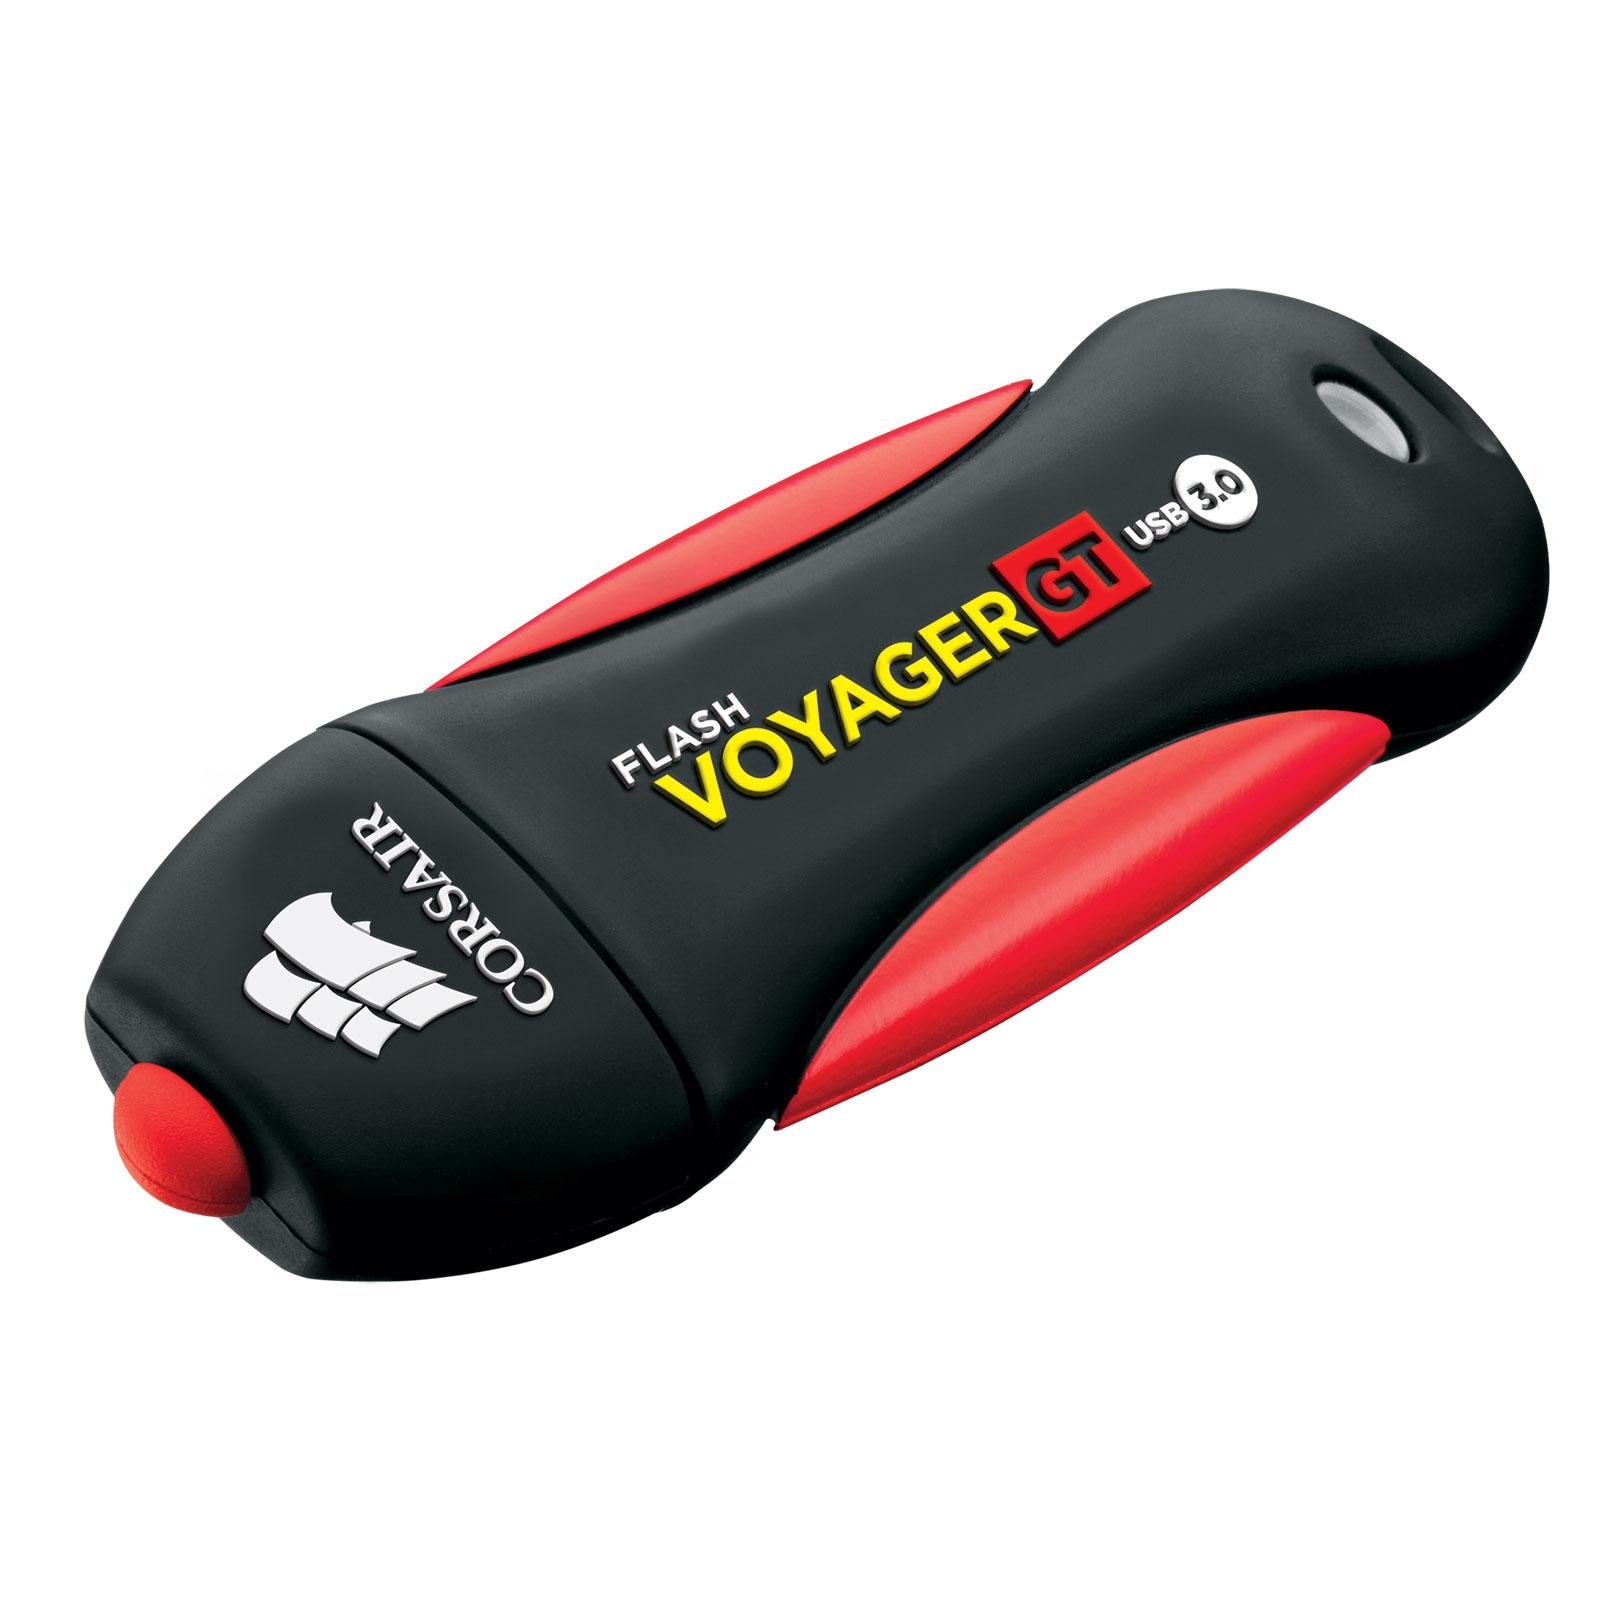 USB Flash Drive 64Gb - Exployd 570 EX-64GB-570-Orange